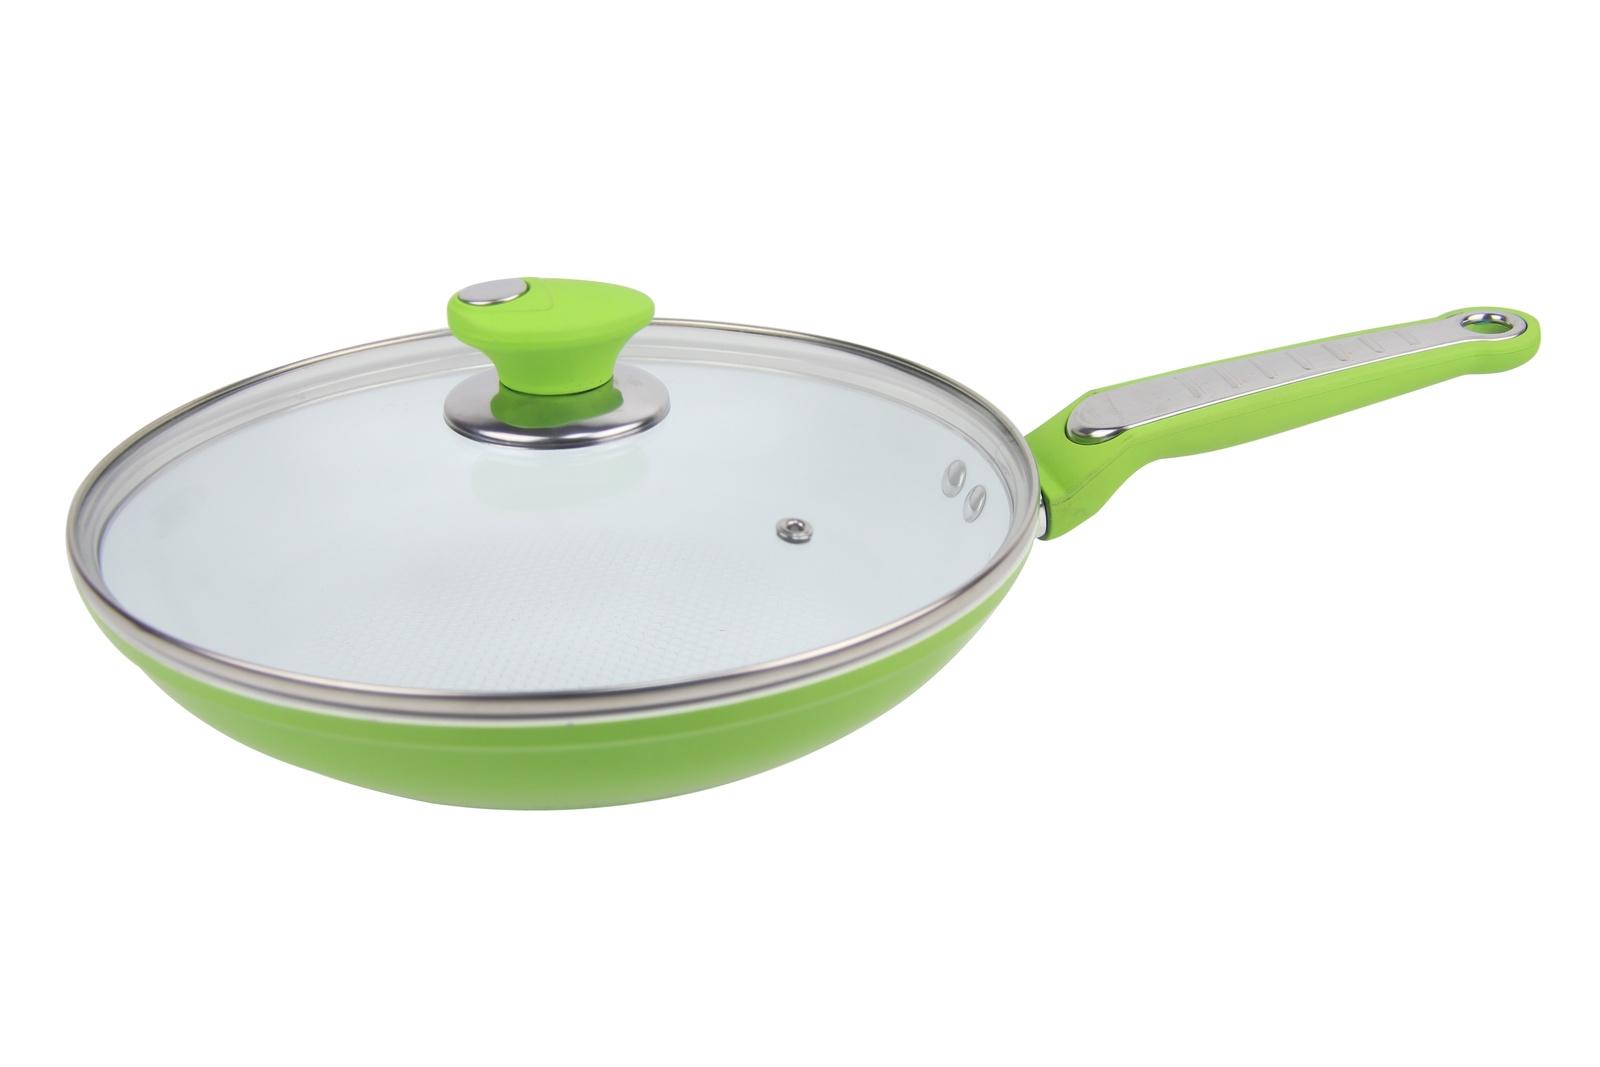 Сковорода Bohmann BH-7826, диаметр 26 см, зеленый сковорода bohmann 28cm bh 1010 28mrb